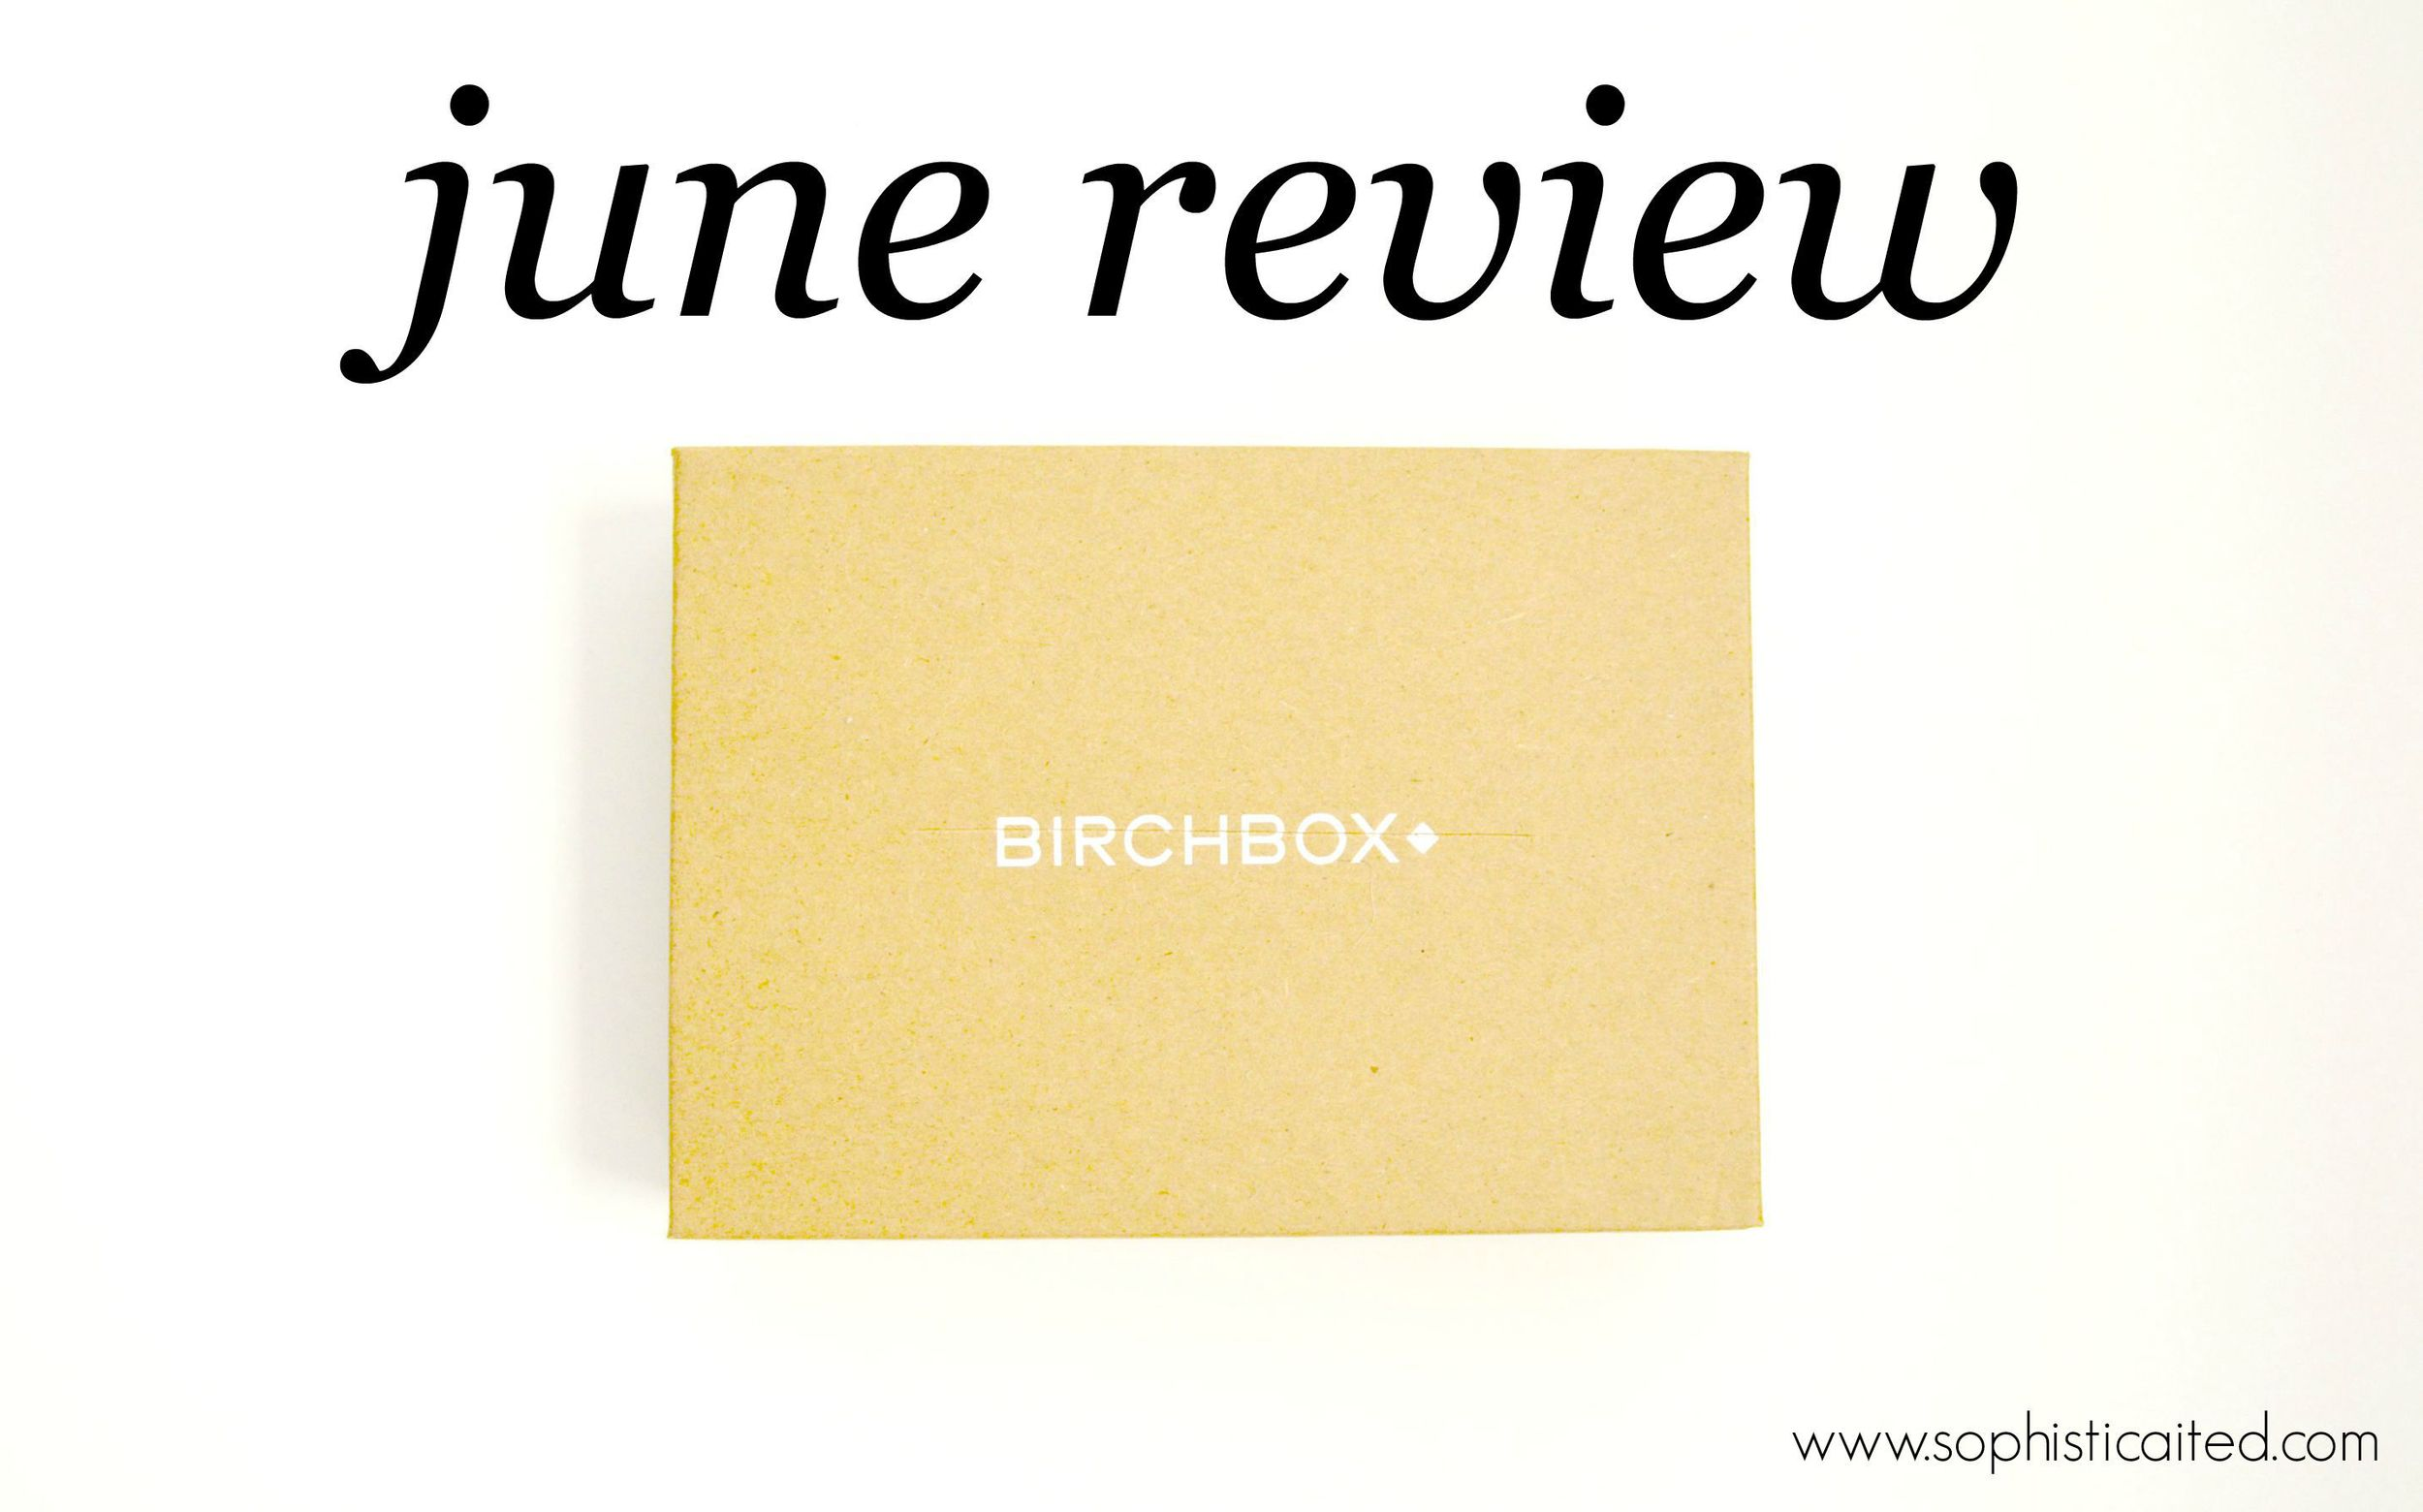 Birchbox Review on Sophisticaited